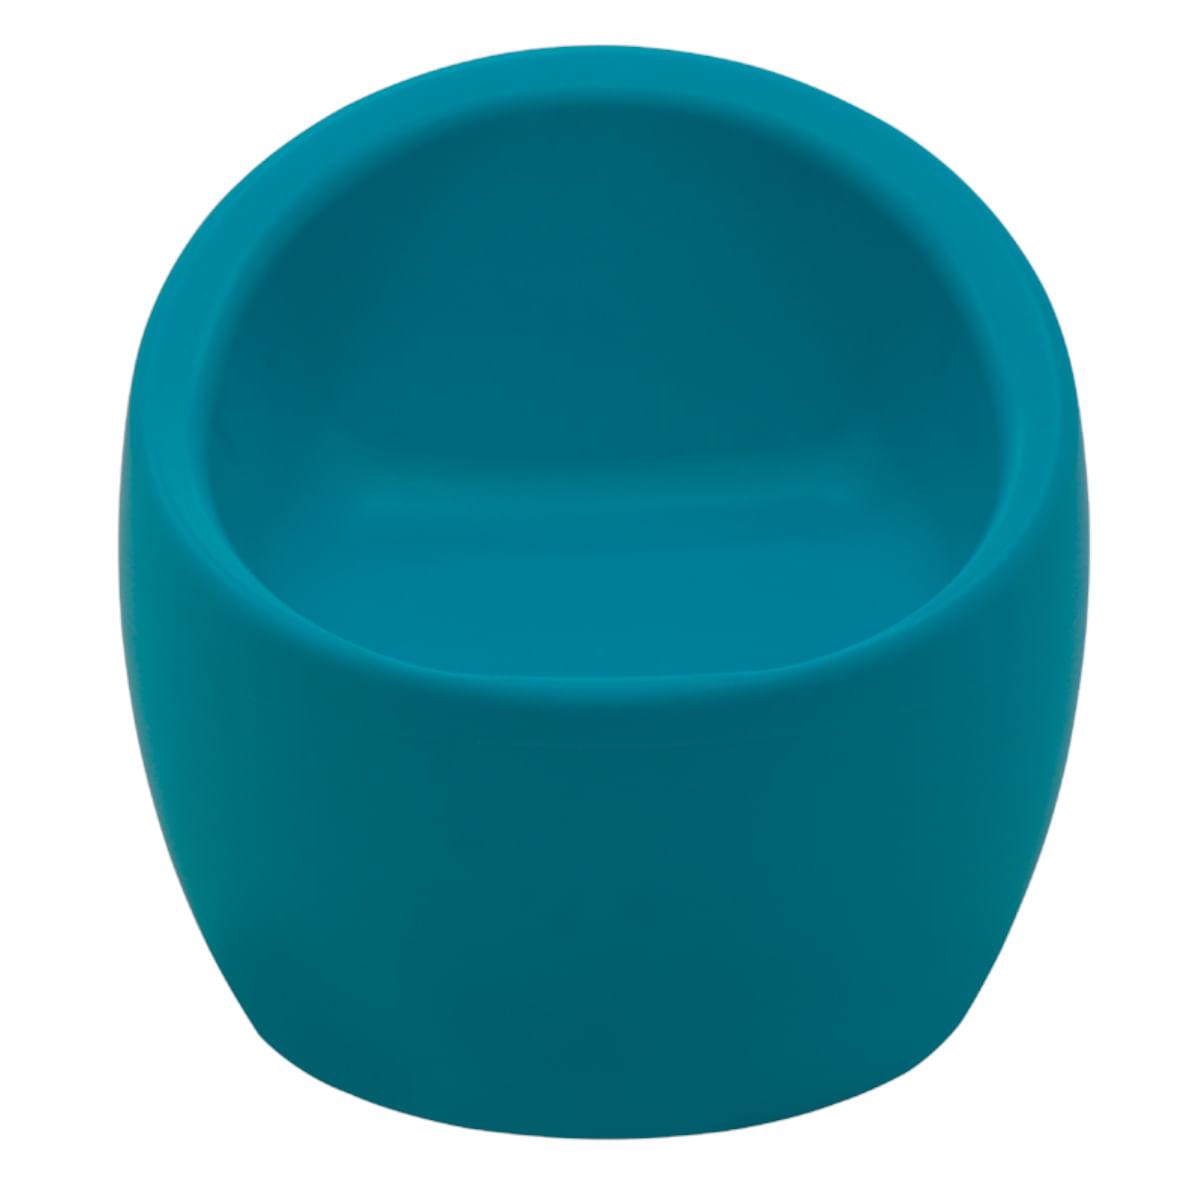 Poltrona Oca Infantil Tramontina em Polietileno Azul